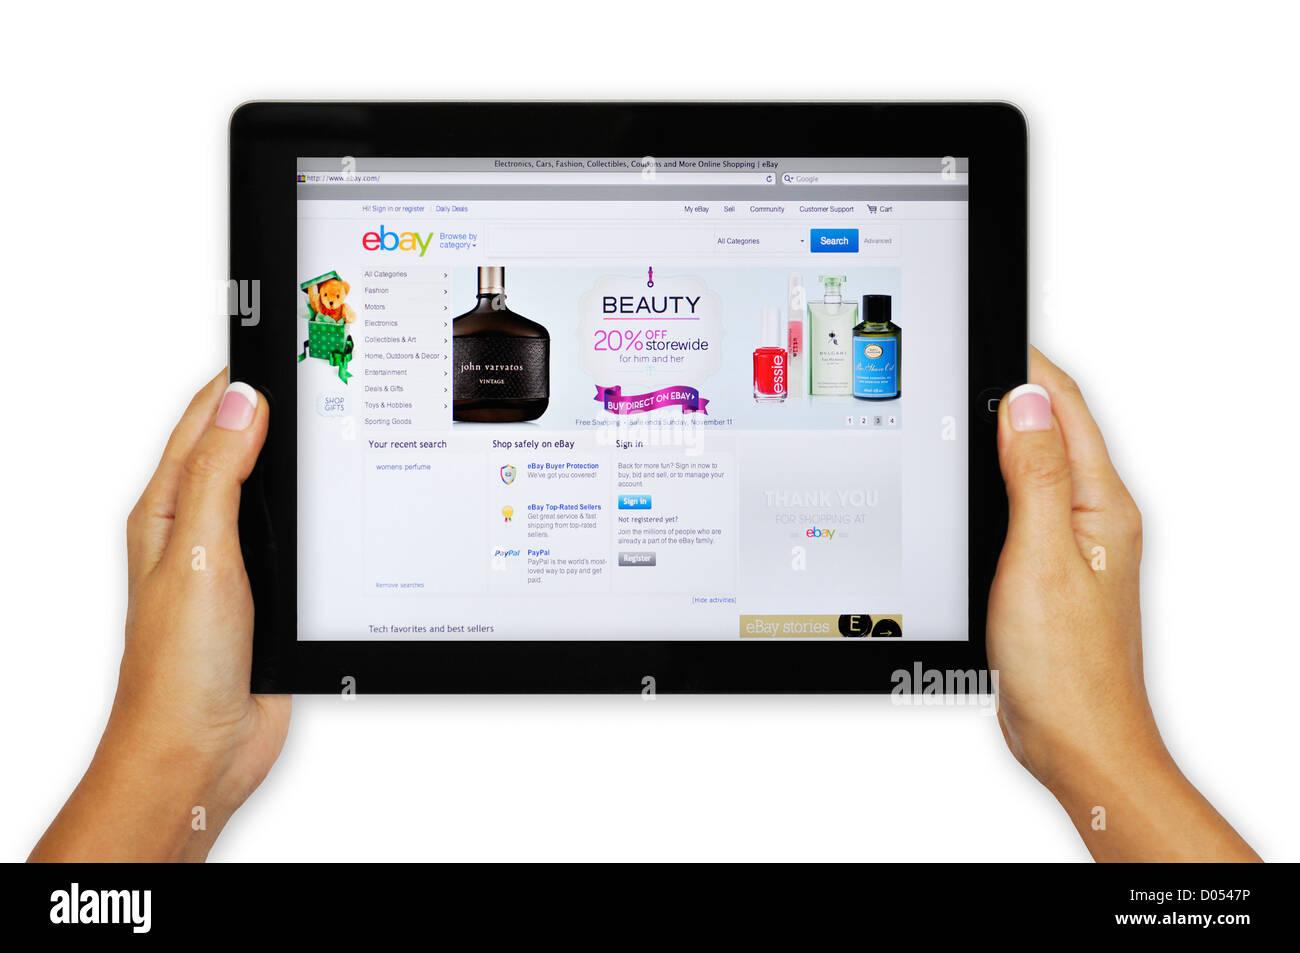 iPad screen showing Ebay website - online shopping - Stock Image